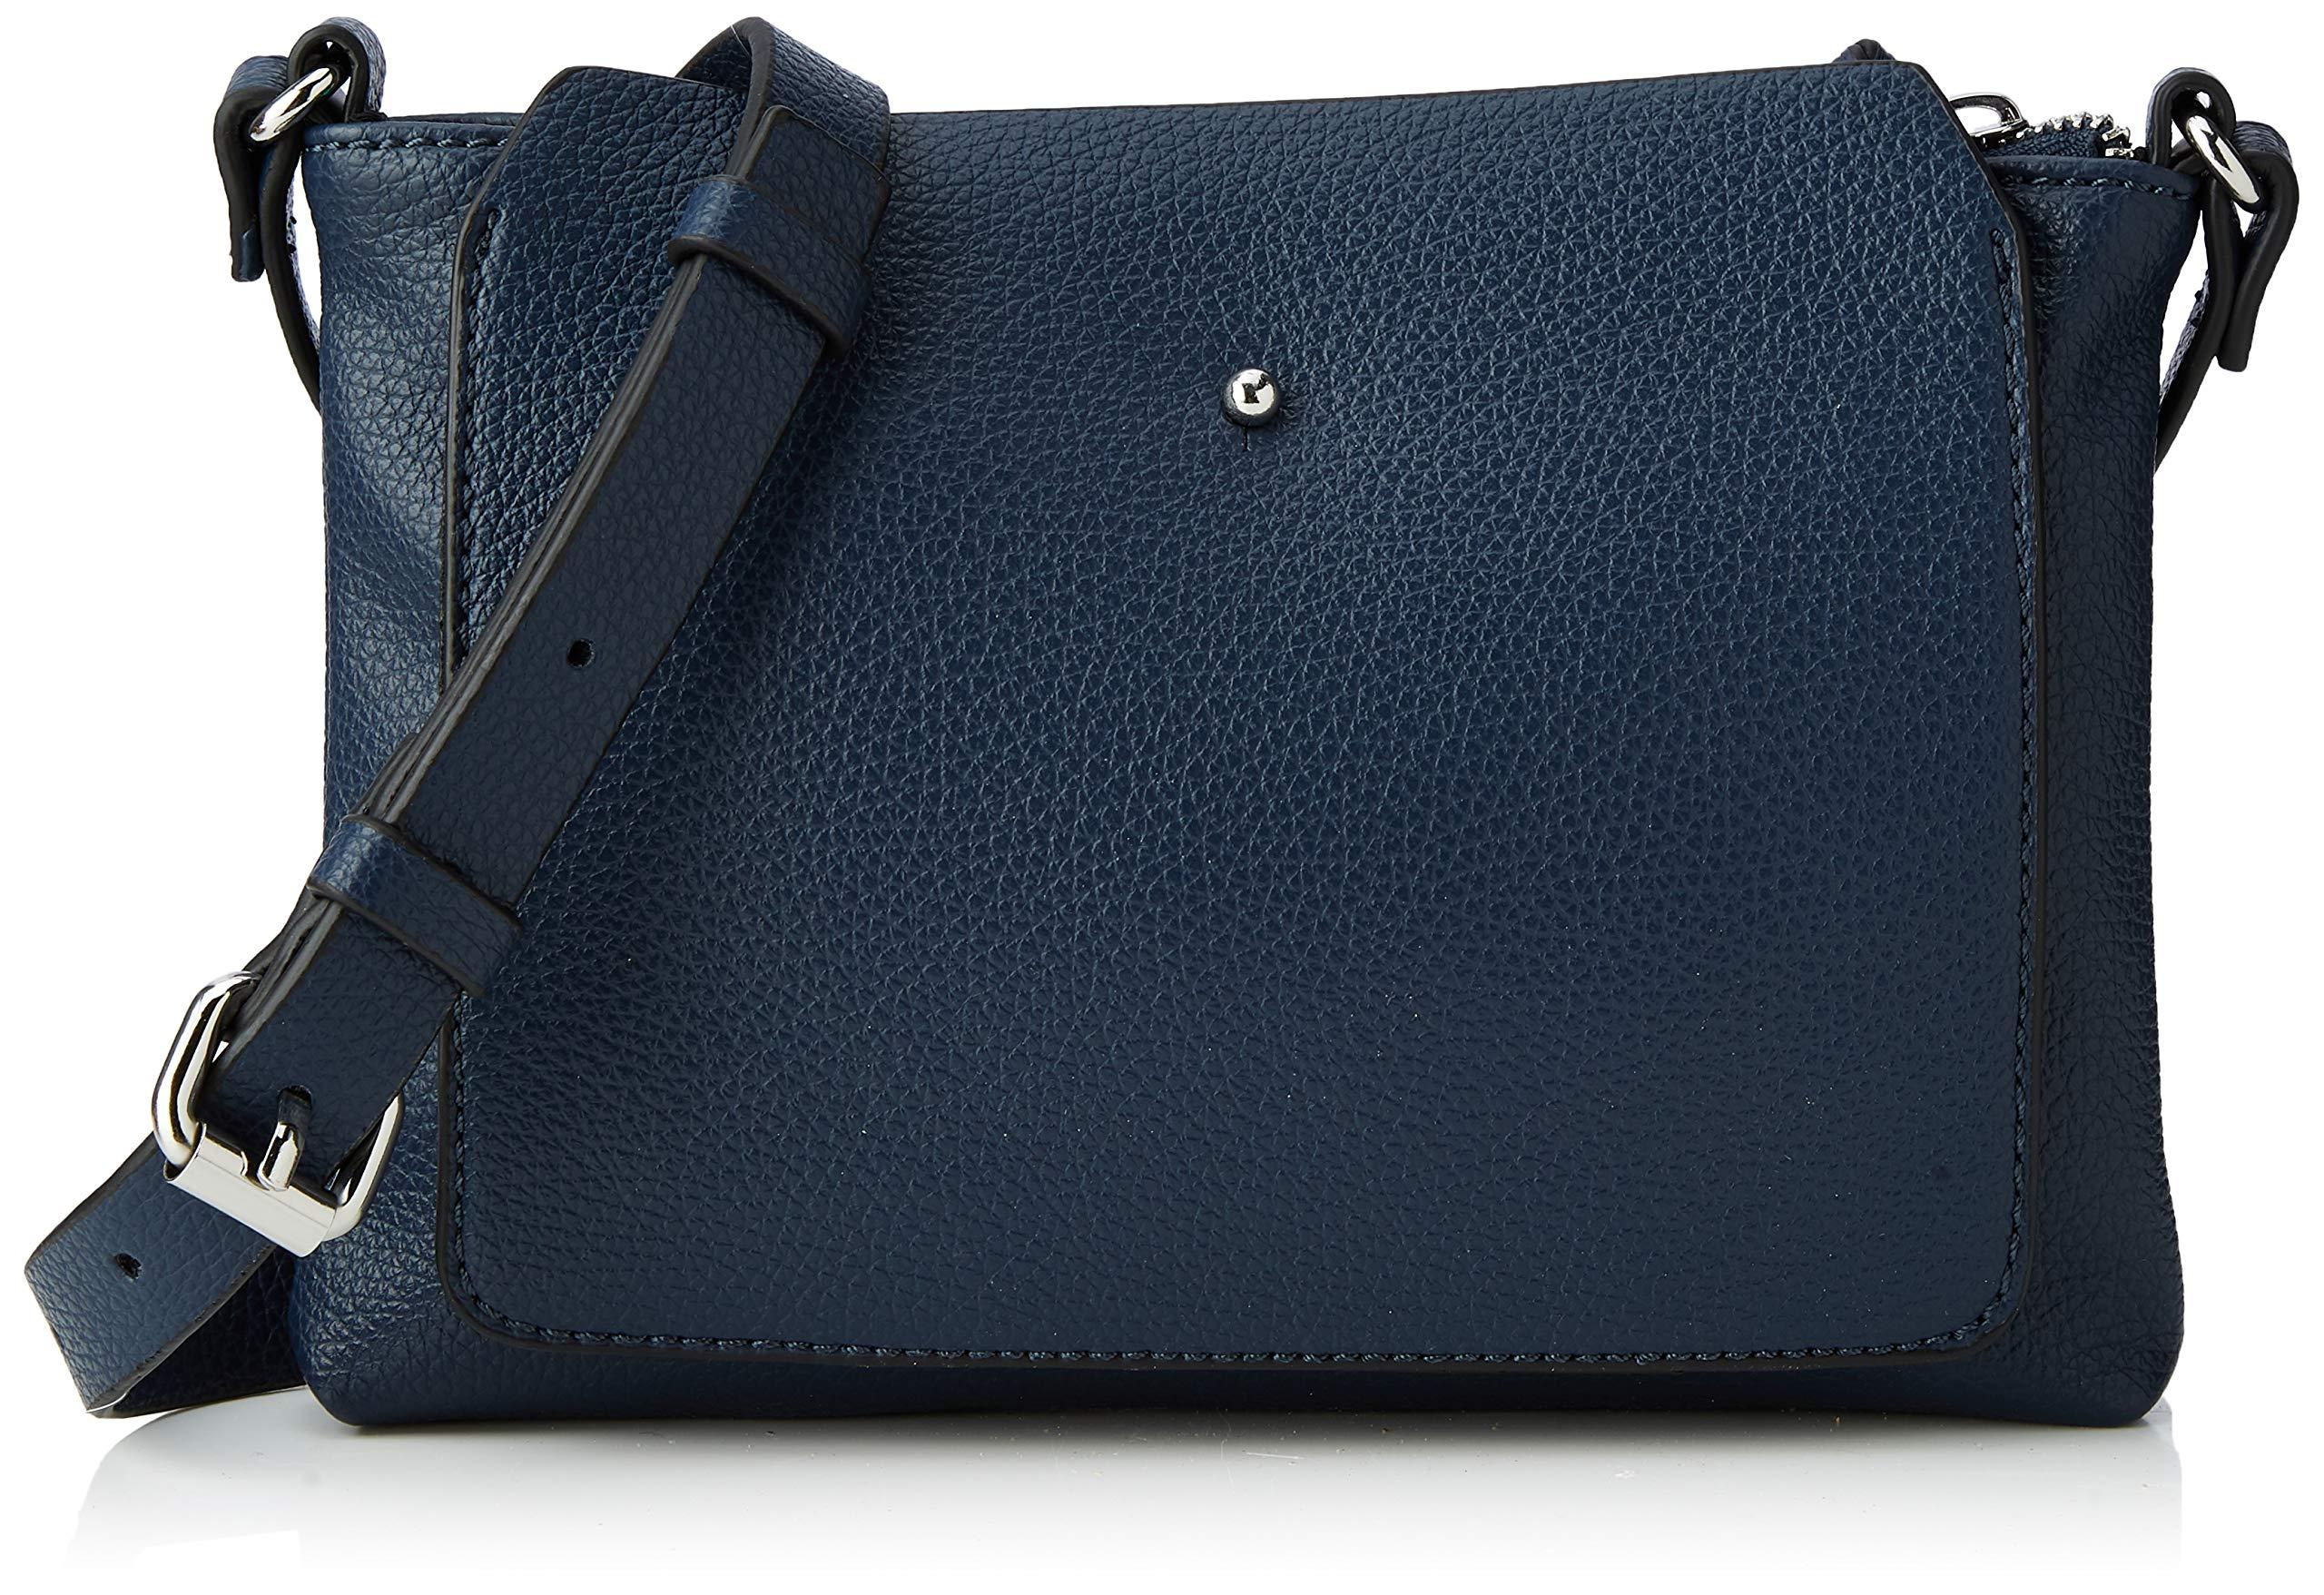 edc by Esprit Accessories 128ca1o003 Women's Shoulder Bag, Blue (Navy), 2x16x21.5 cm